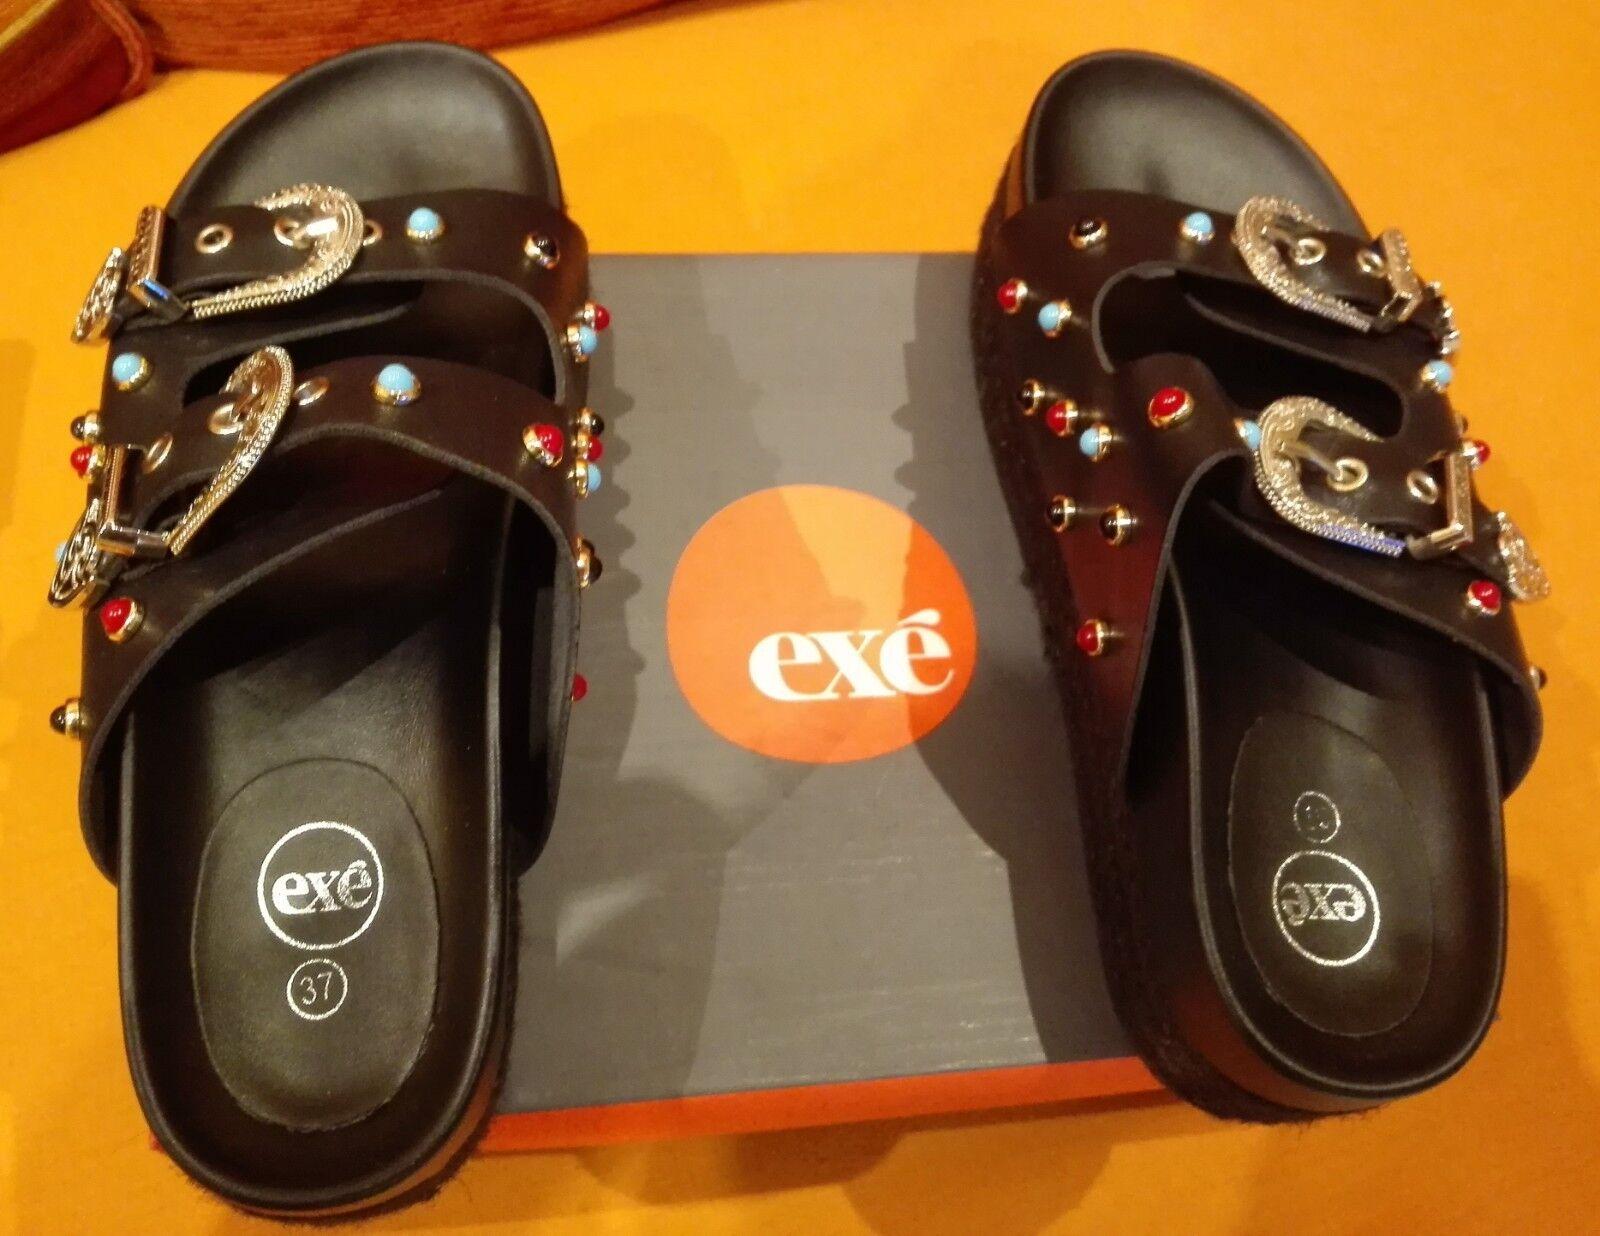 chaussures DA femmes EXE' CouleurE noir MISURA 37 SANDALO USATO OTTIMO STATO